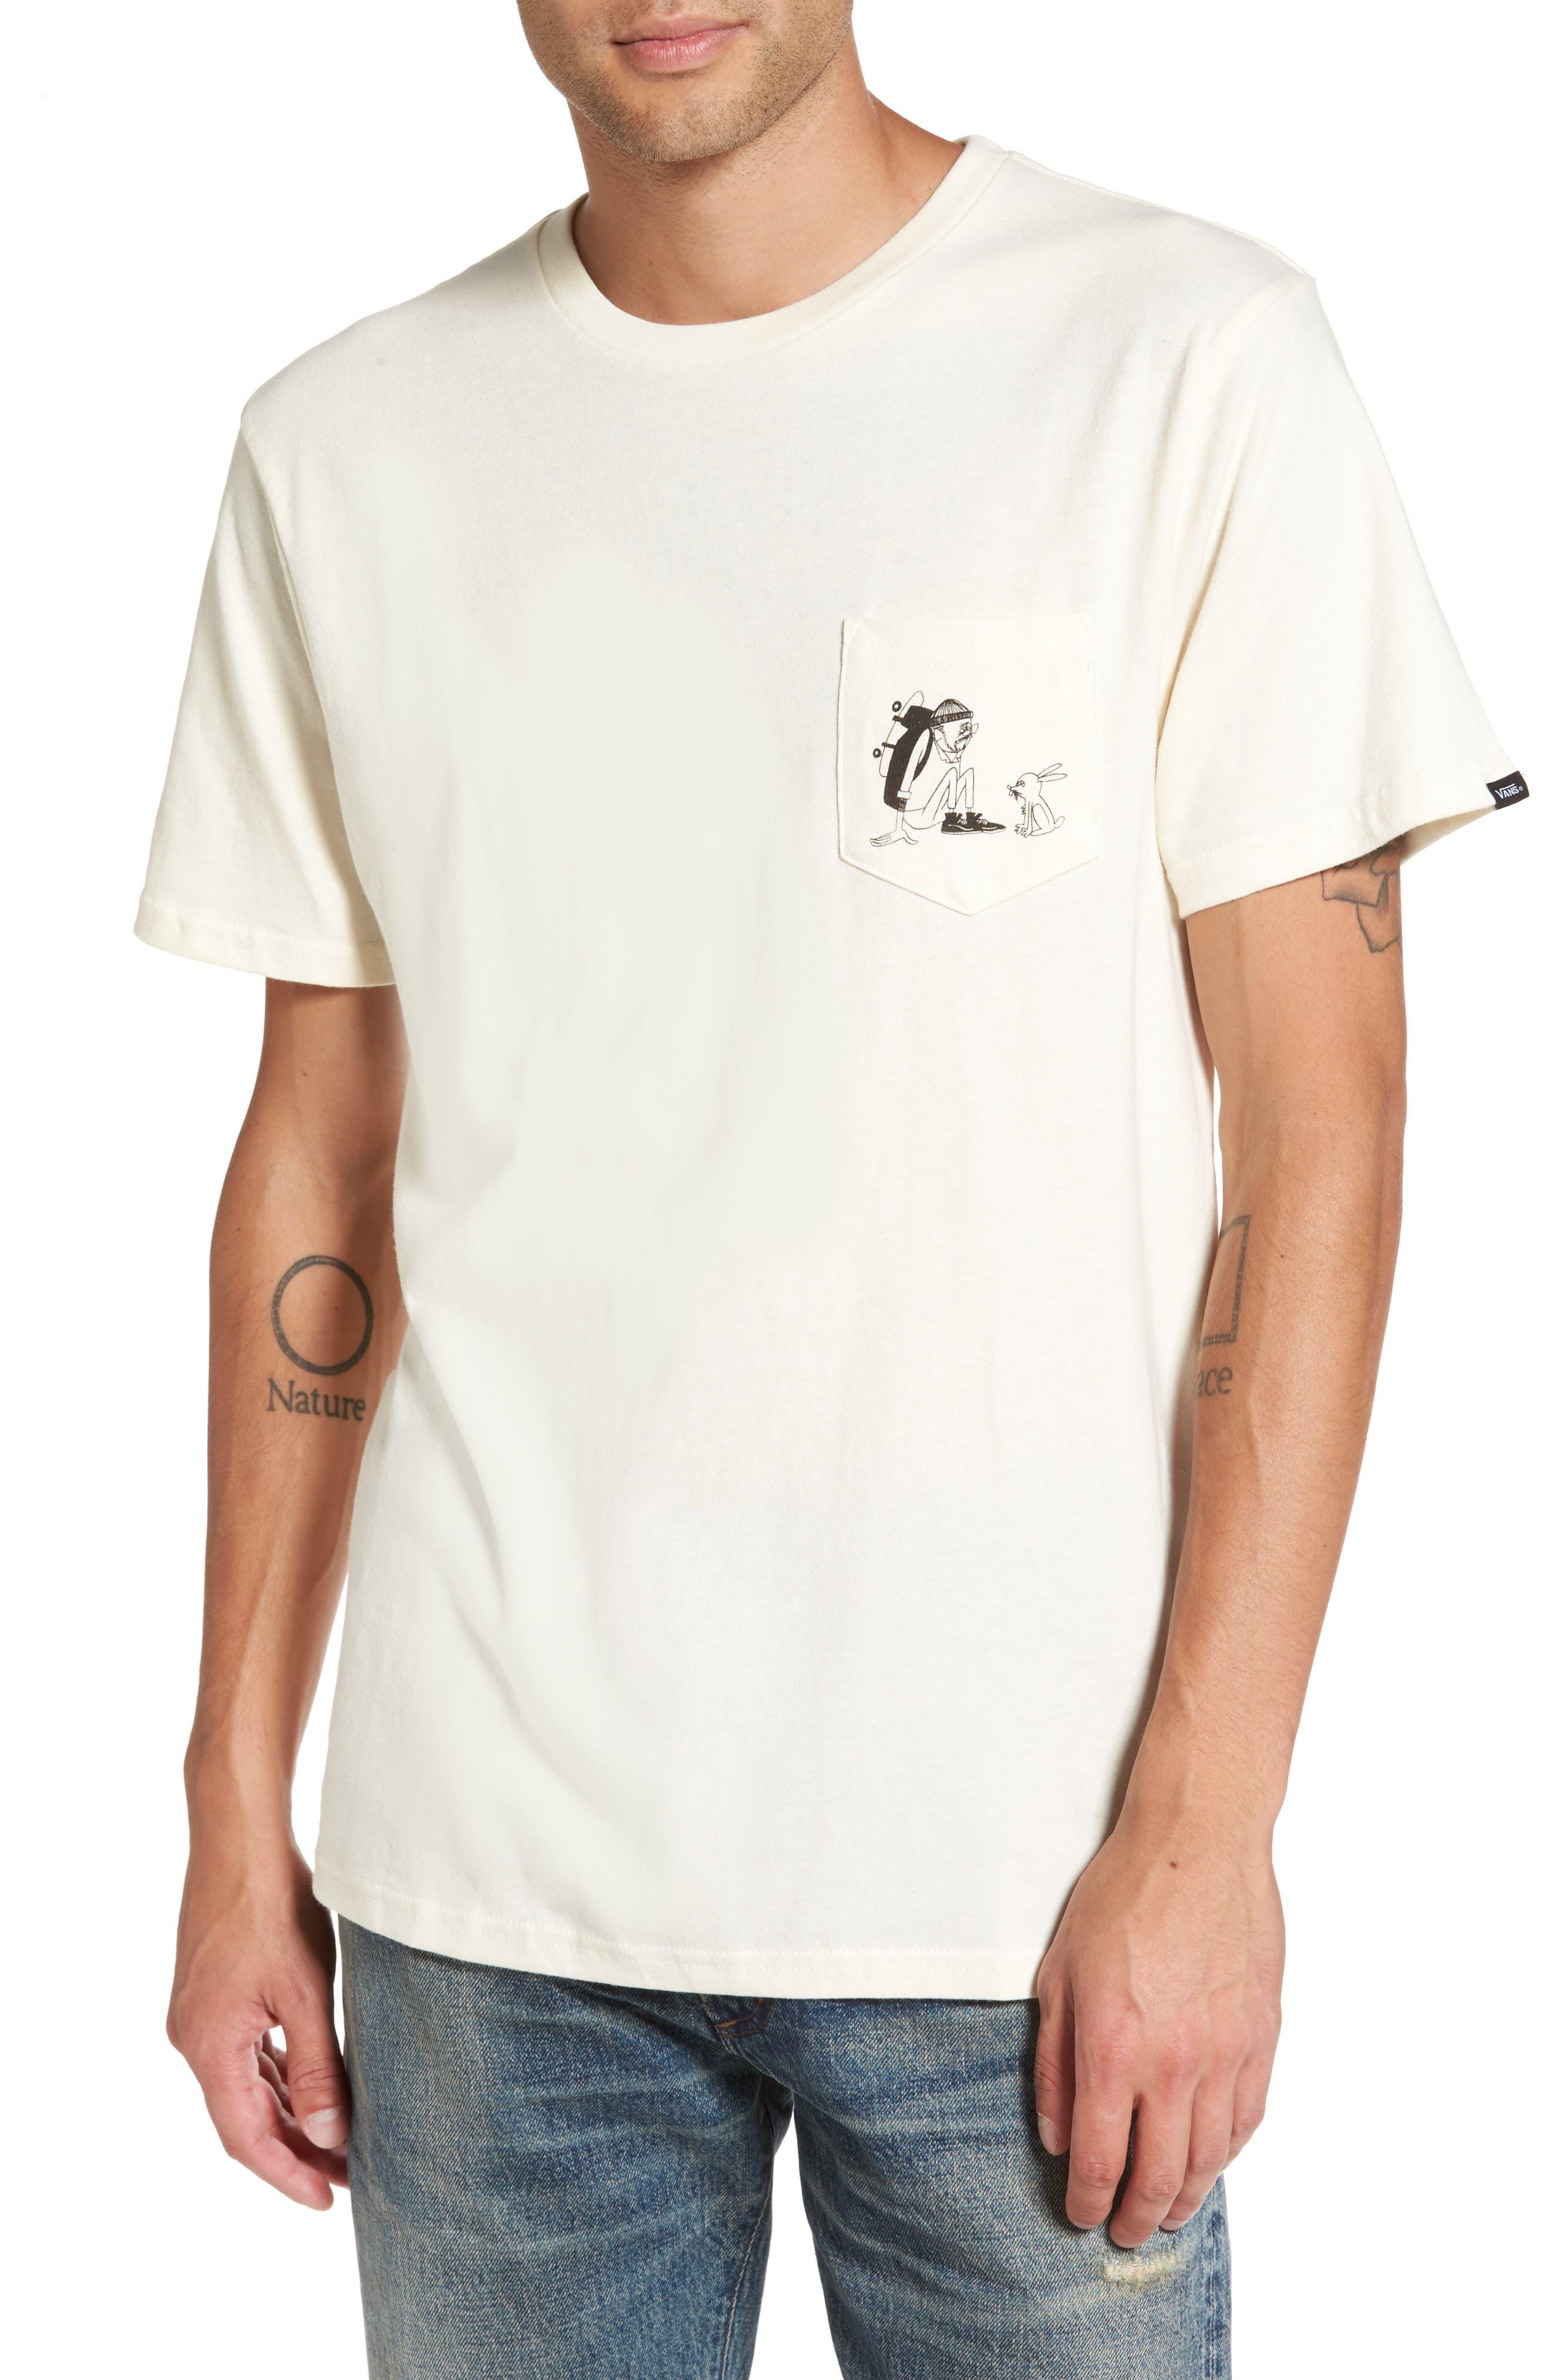 Vans x Yusuke Hanai Outdoors Graphic Pocket T-Shirt